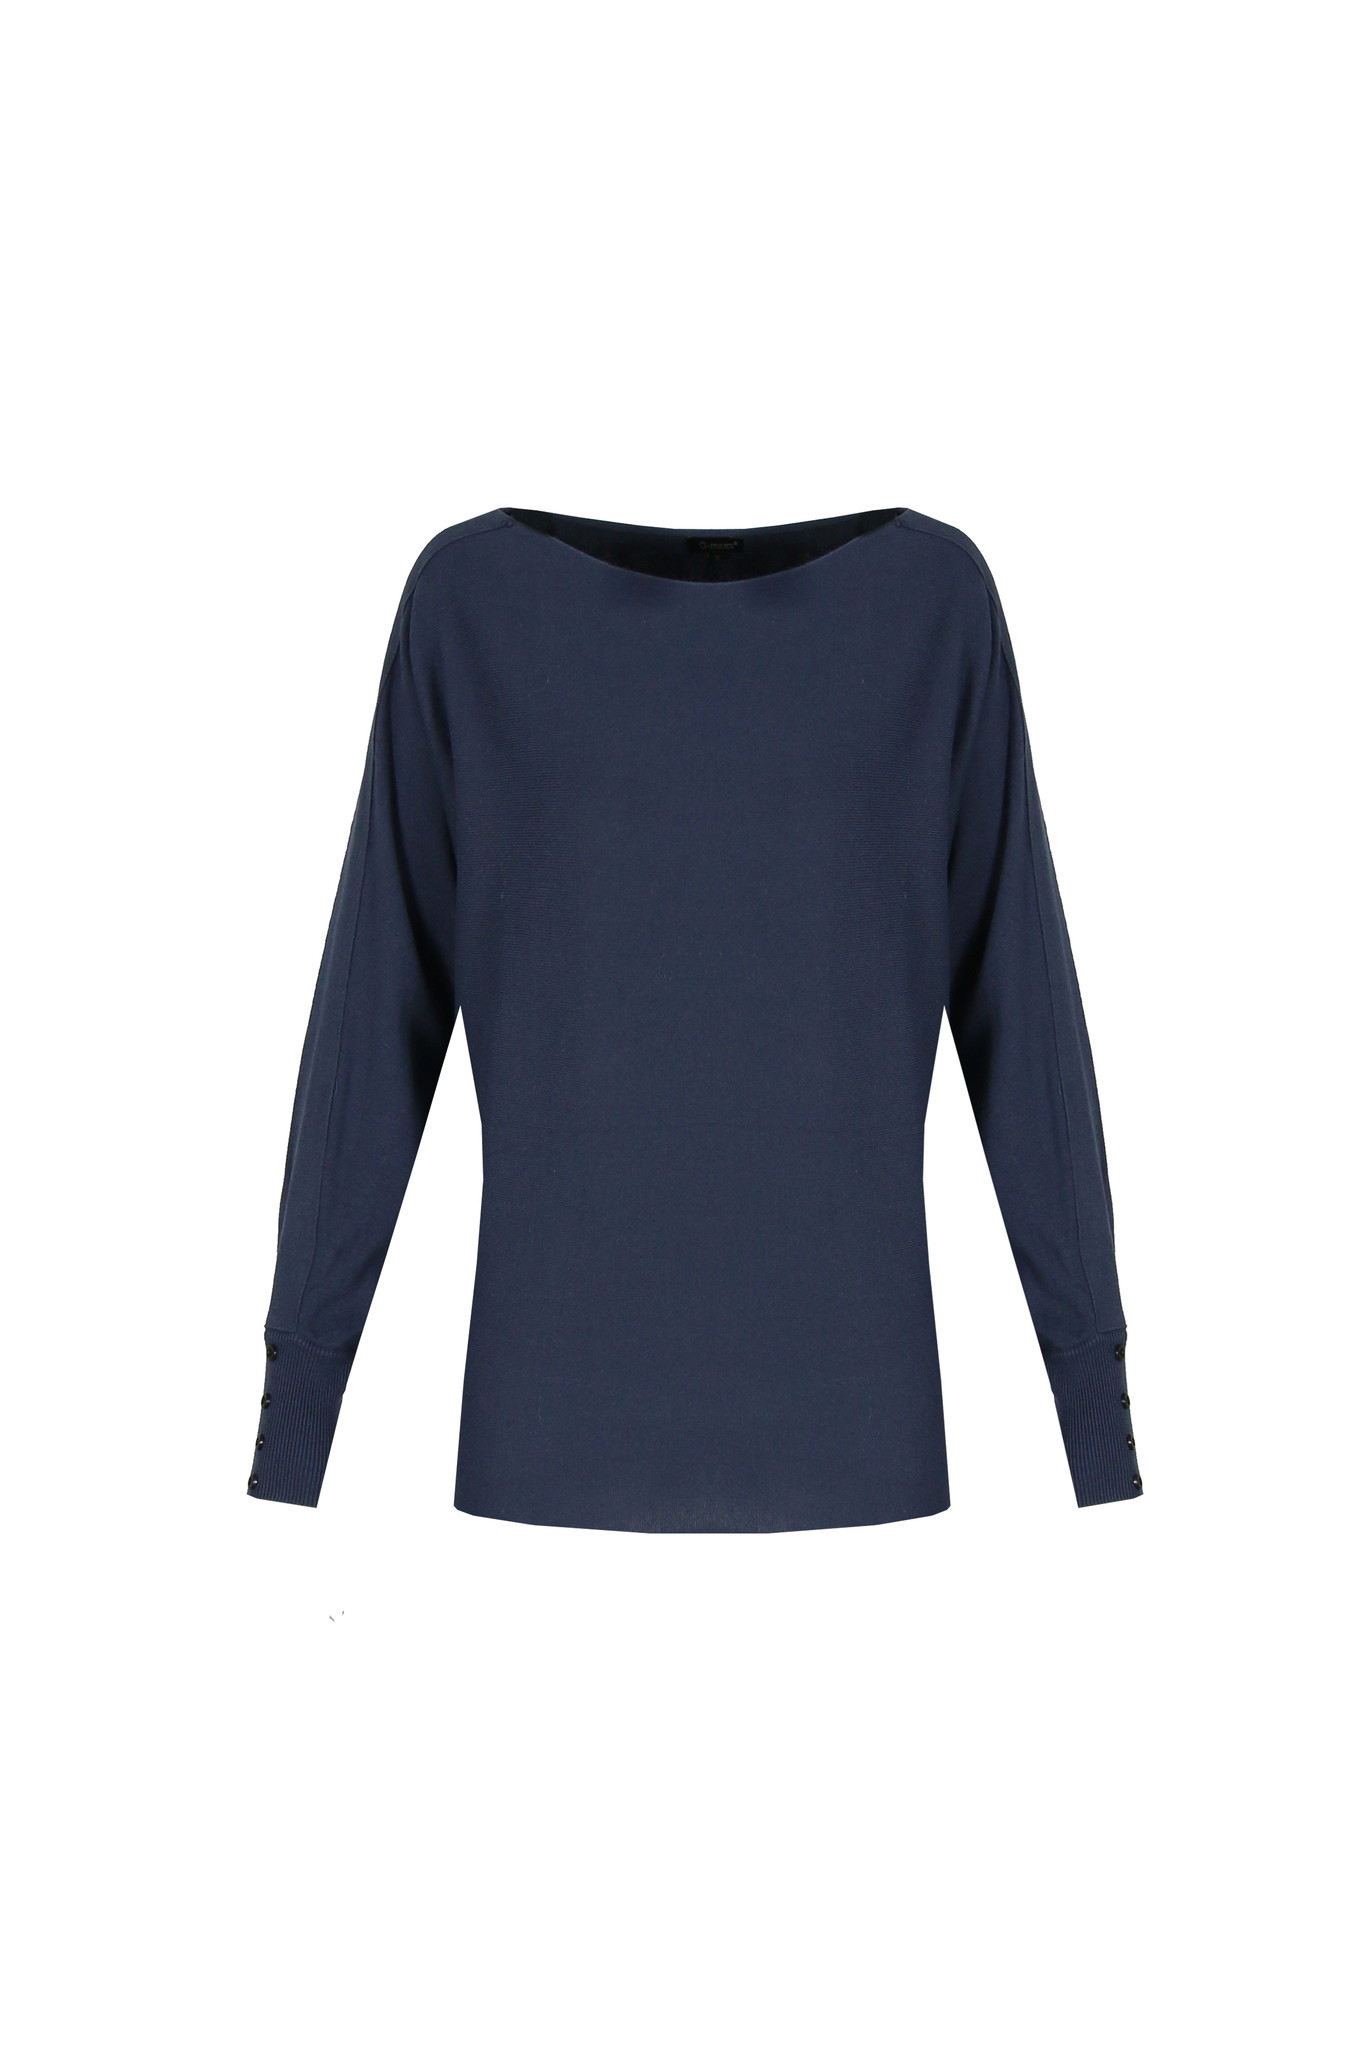 G-Maxx G-Maxx Dalia trui jeans blauw